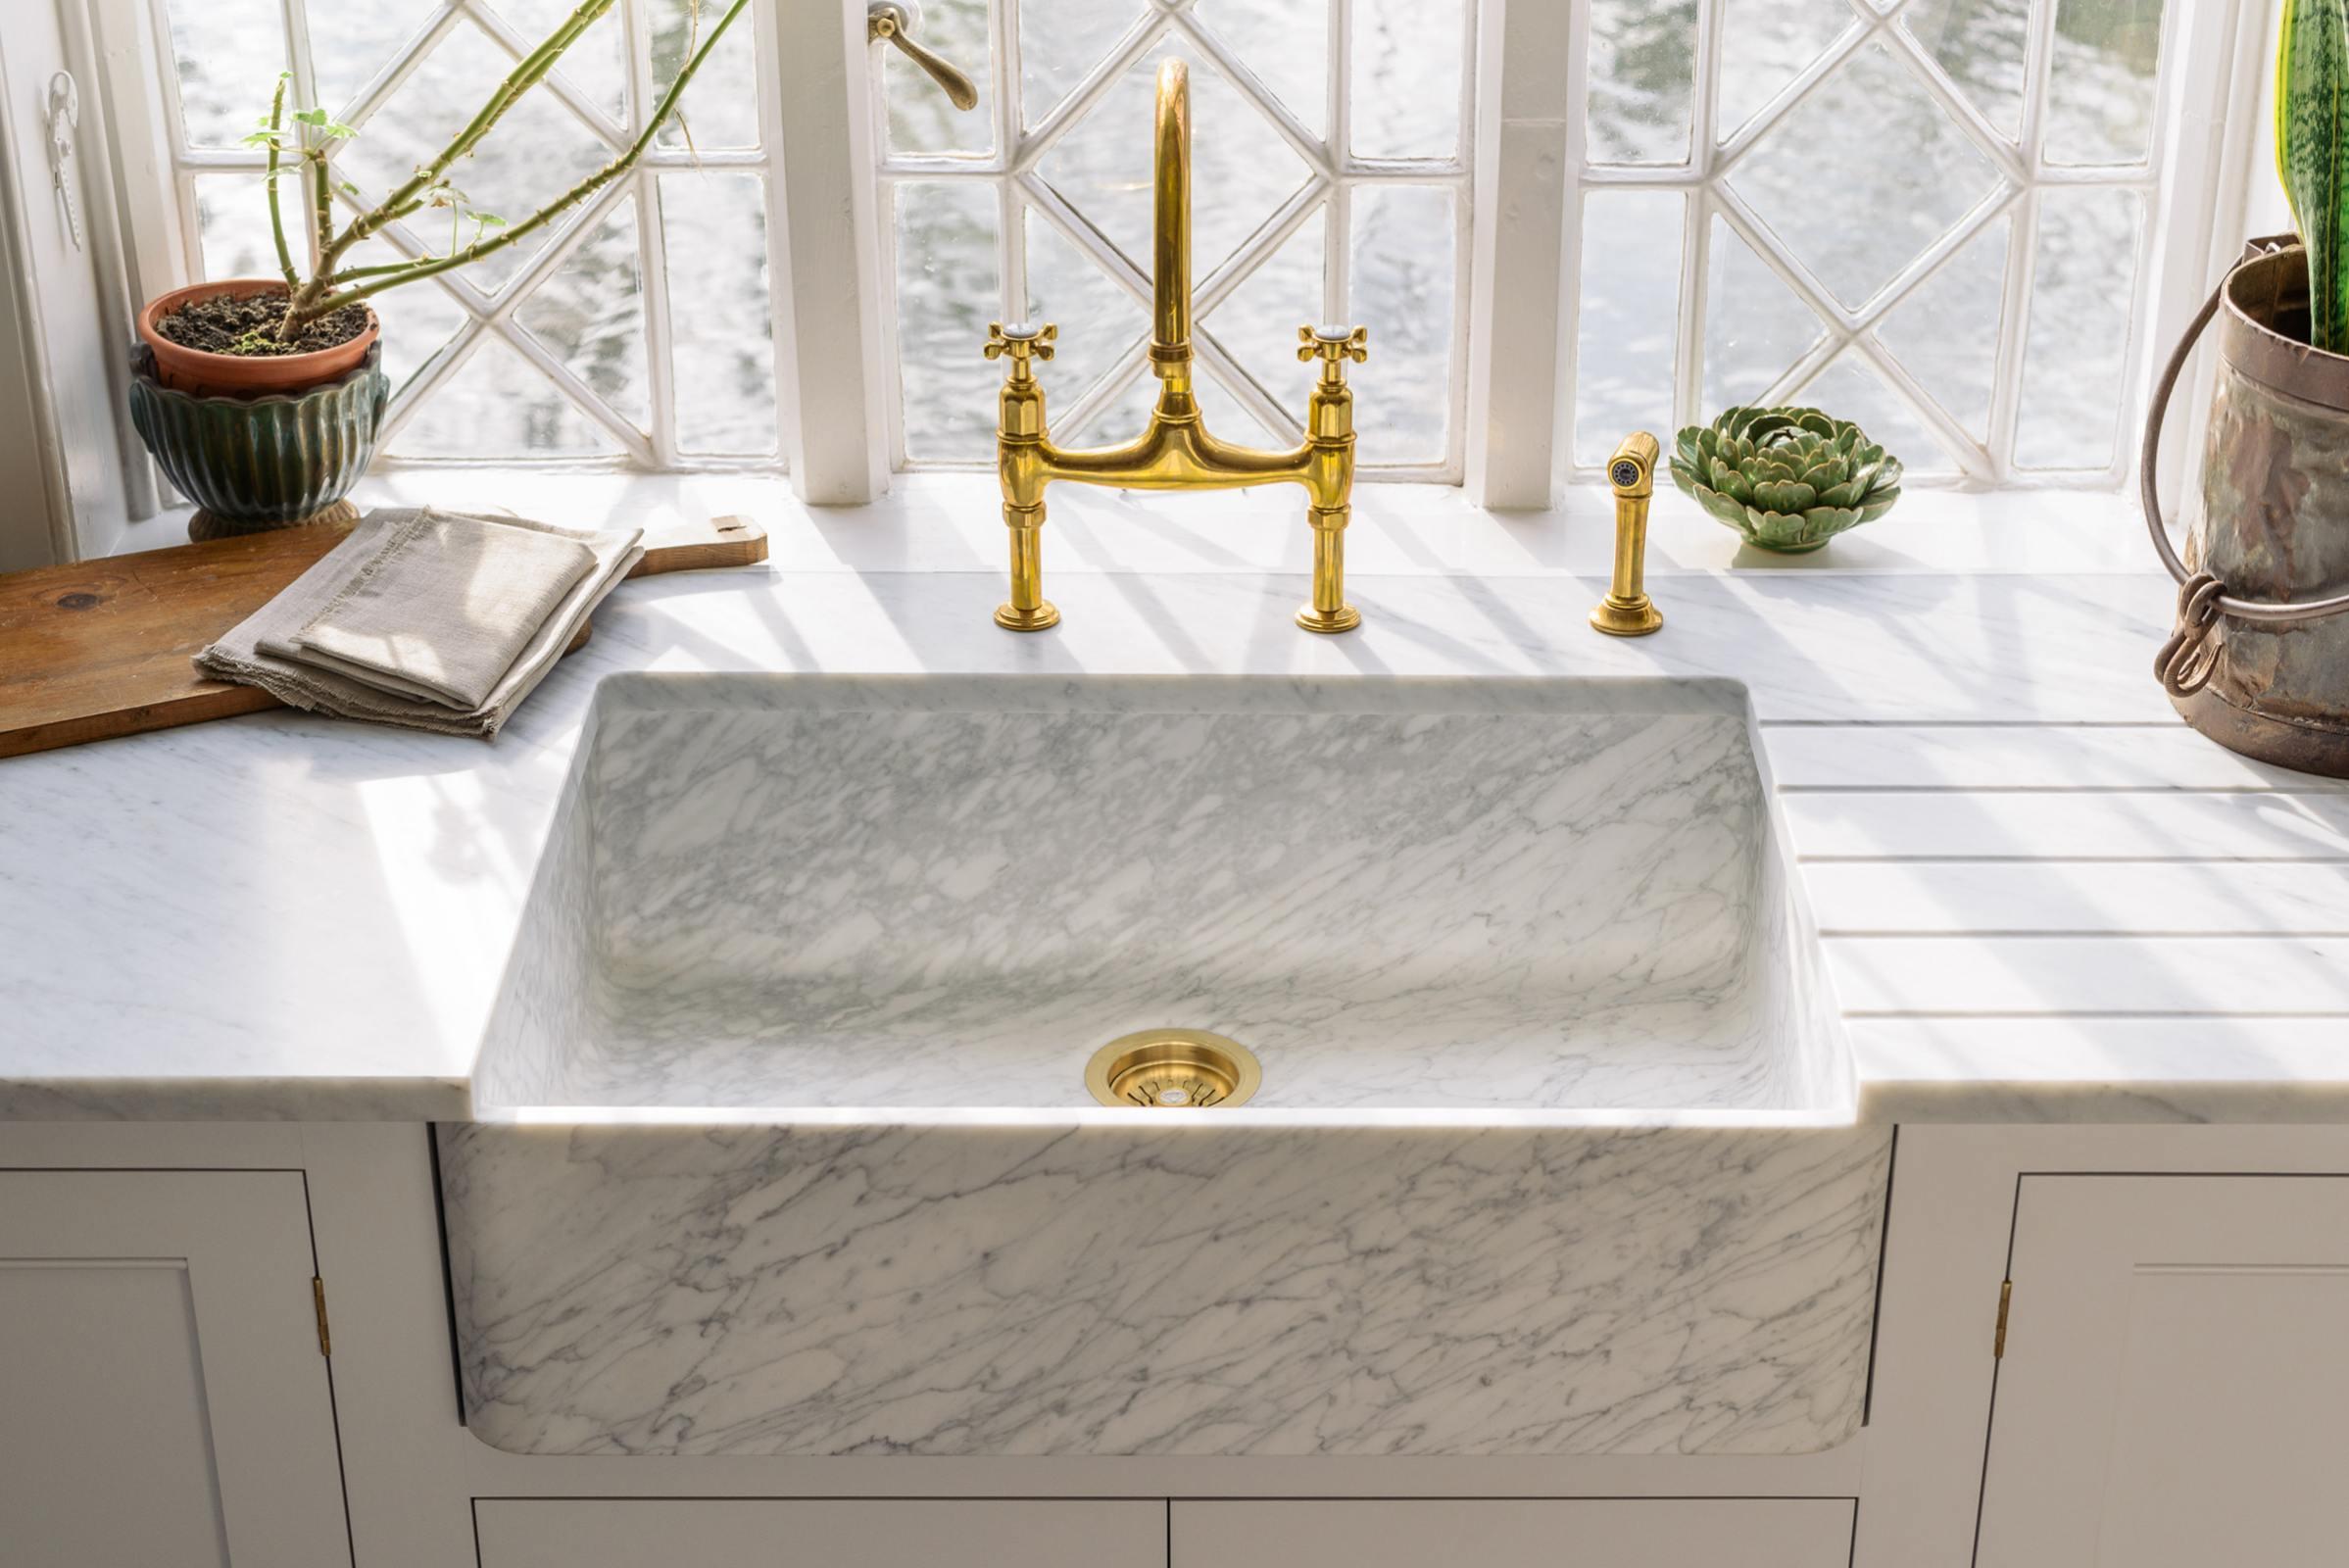 Milano Penthouse 800 Single Marble Sink photo 4